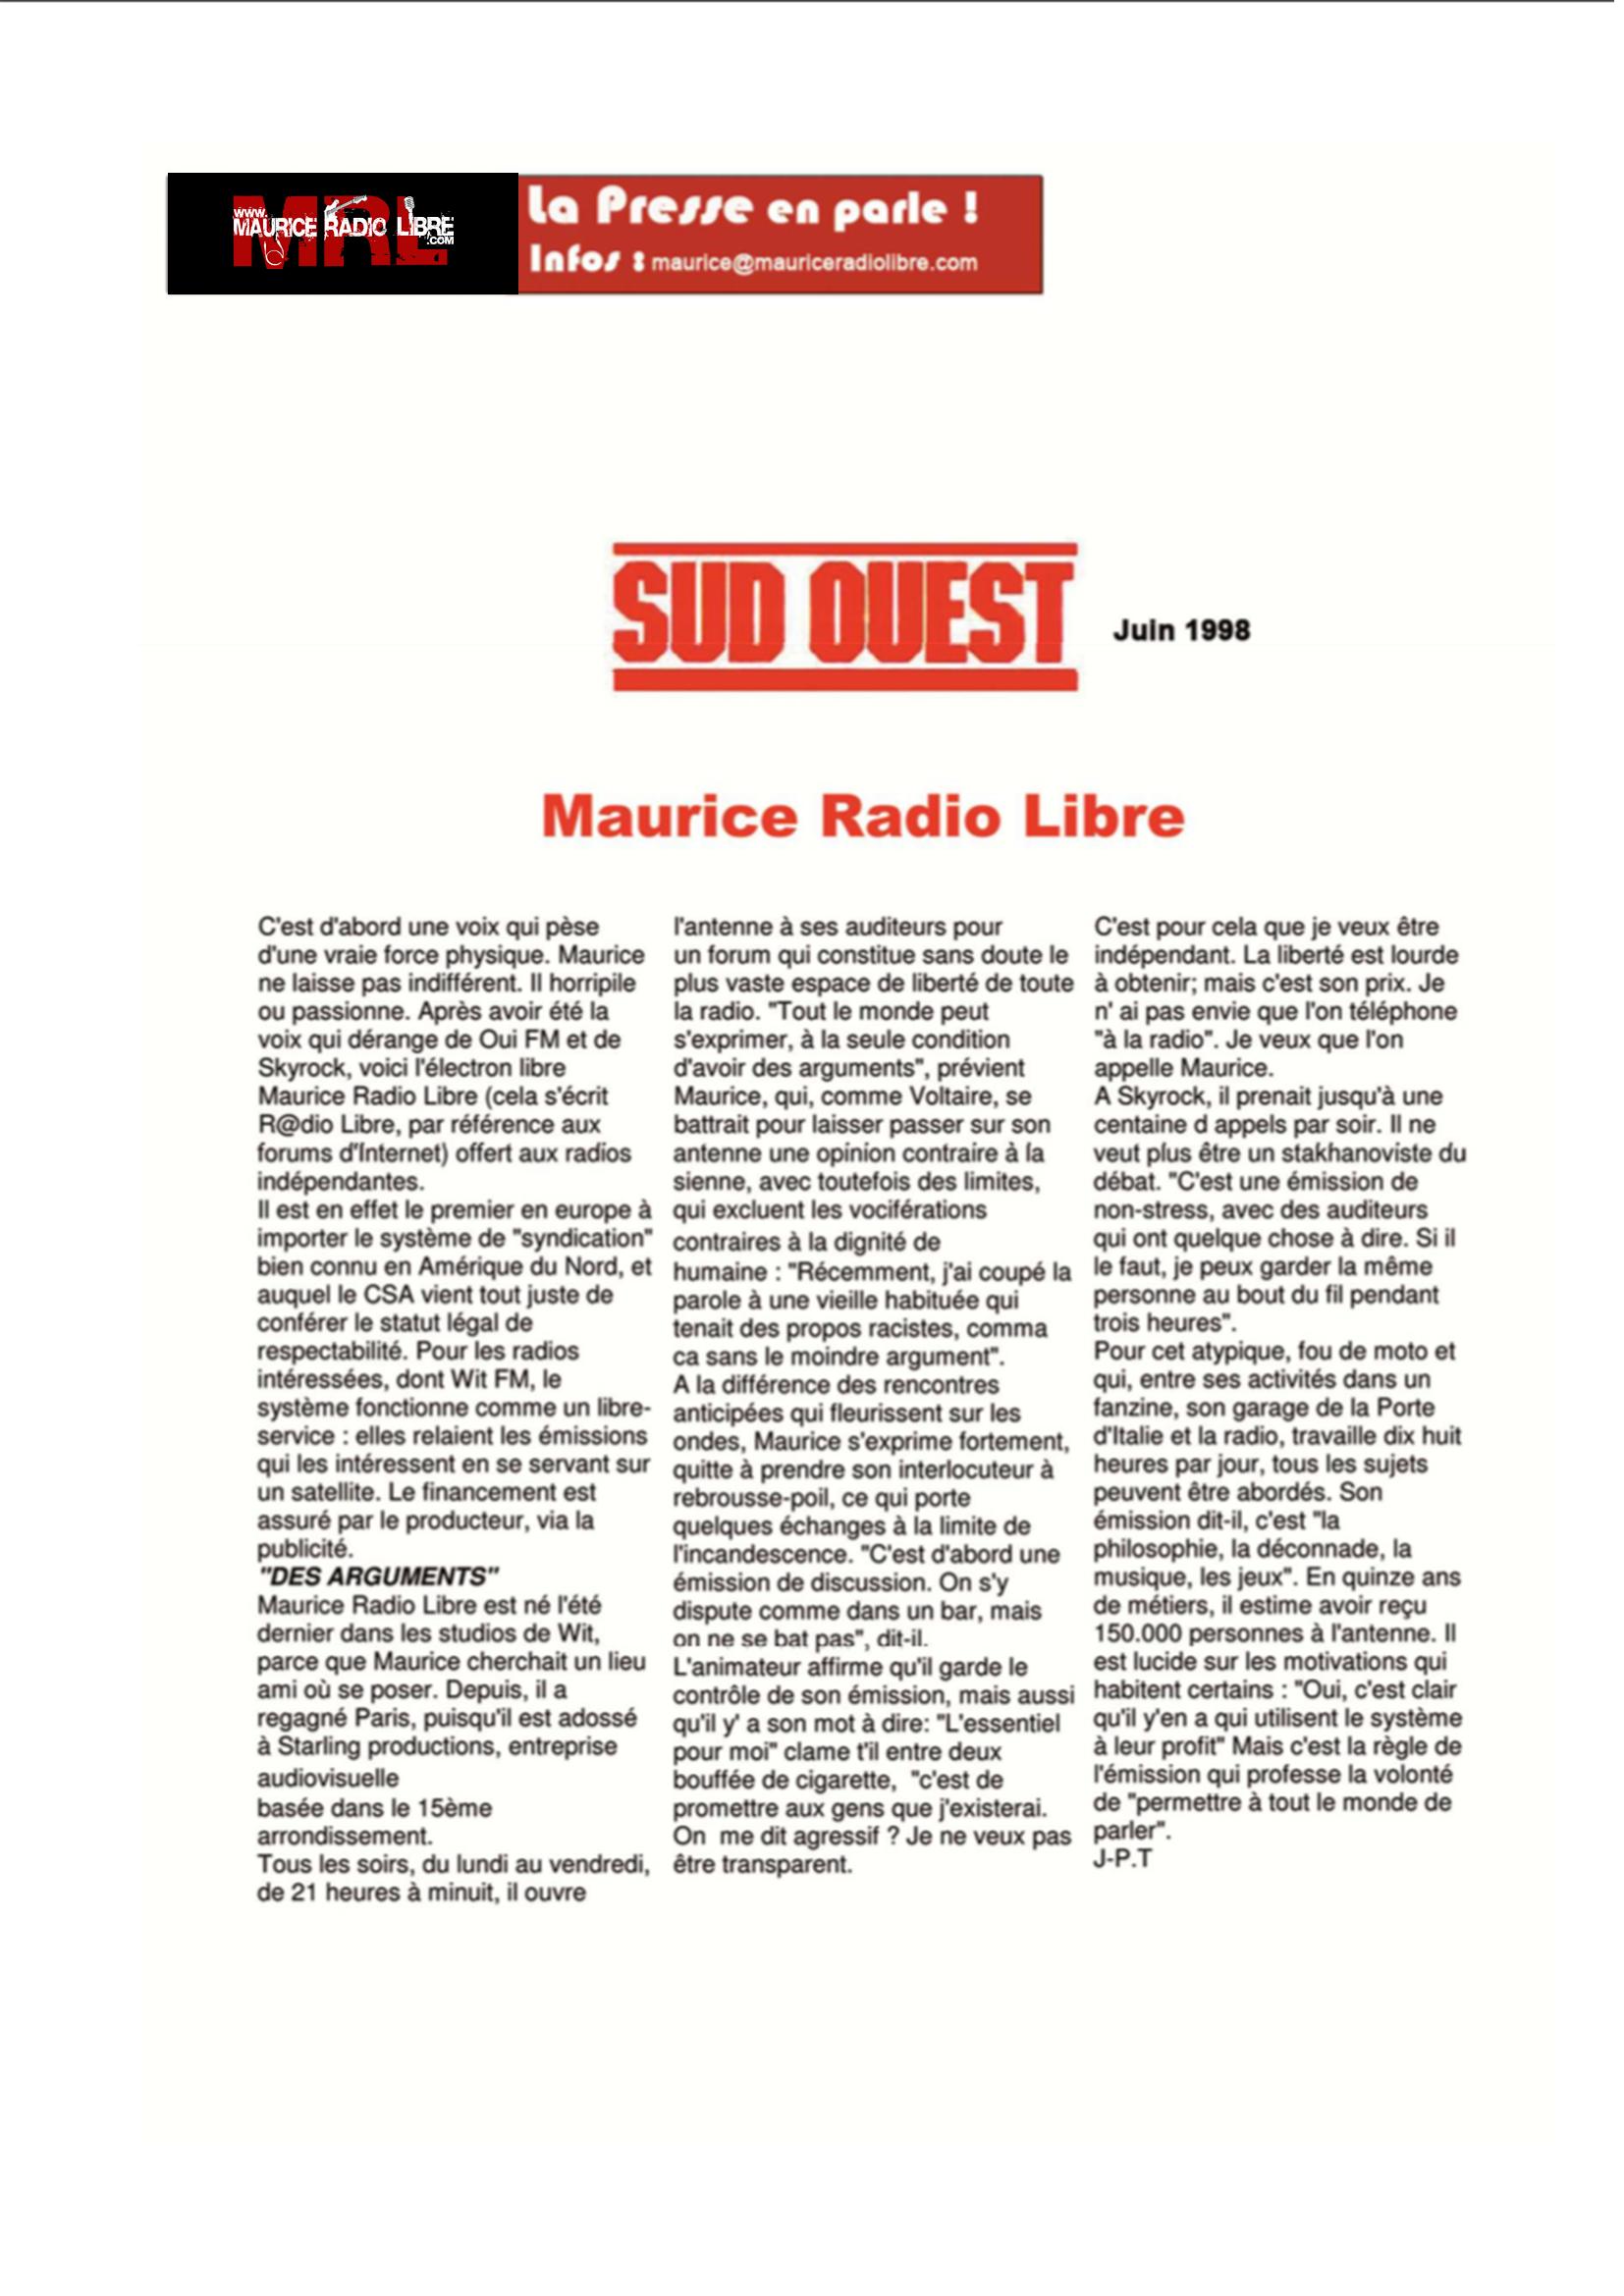 vignette Sud Ouest Maurice Radio Libre - Juin 1998